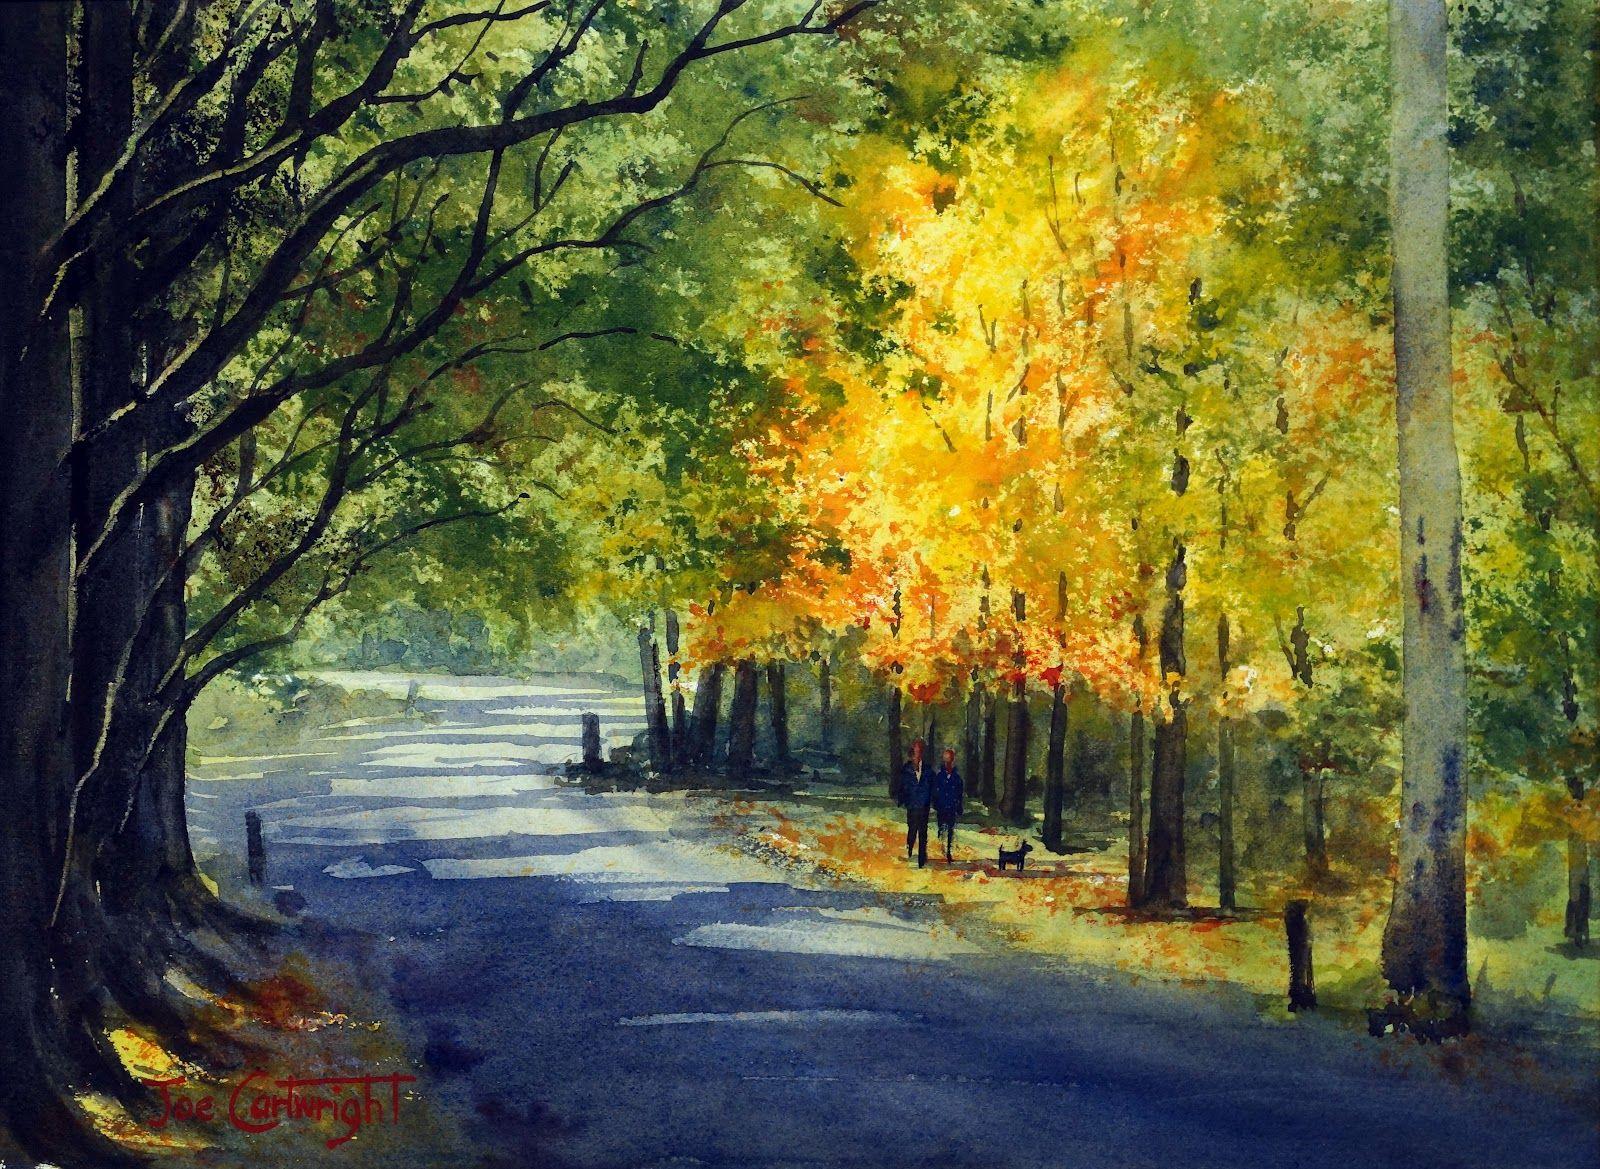 614 best Gallery images on Pinterest | Watercolor landscape ...